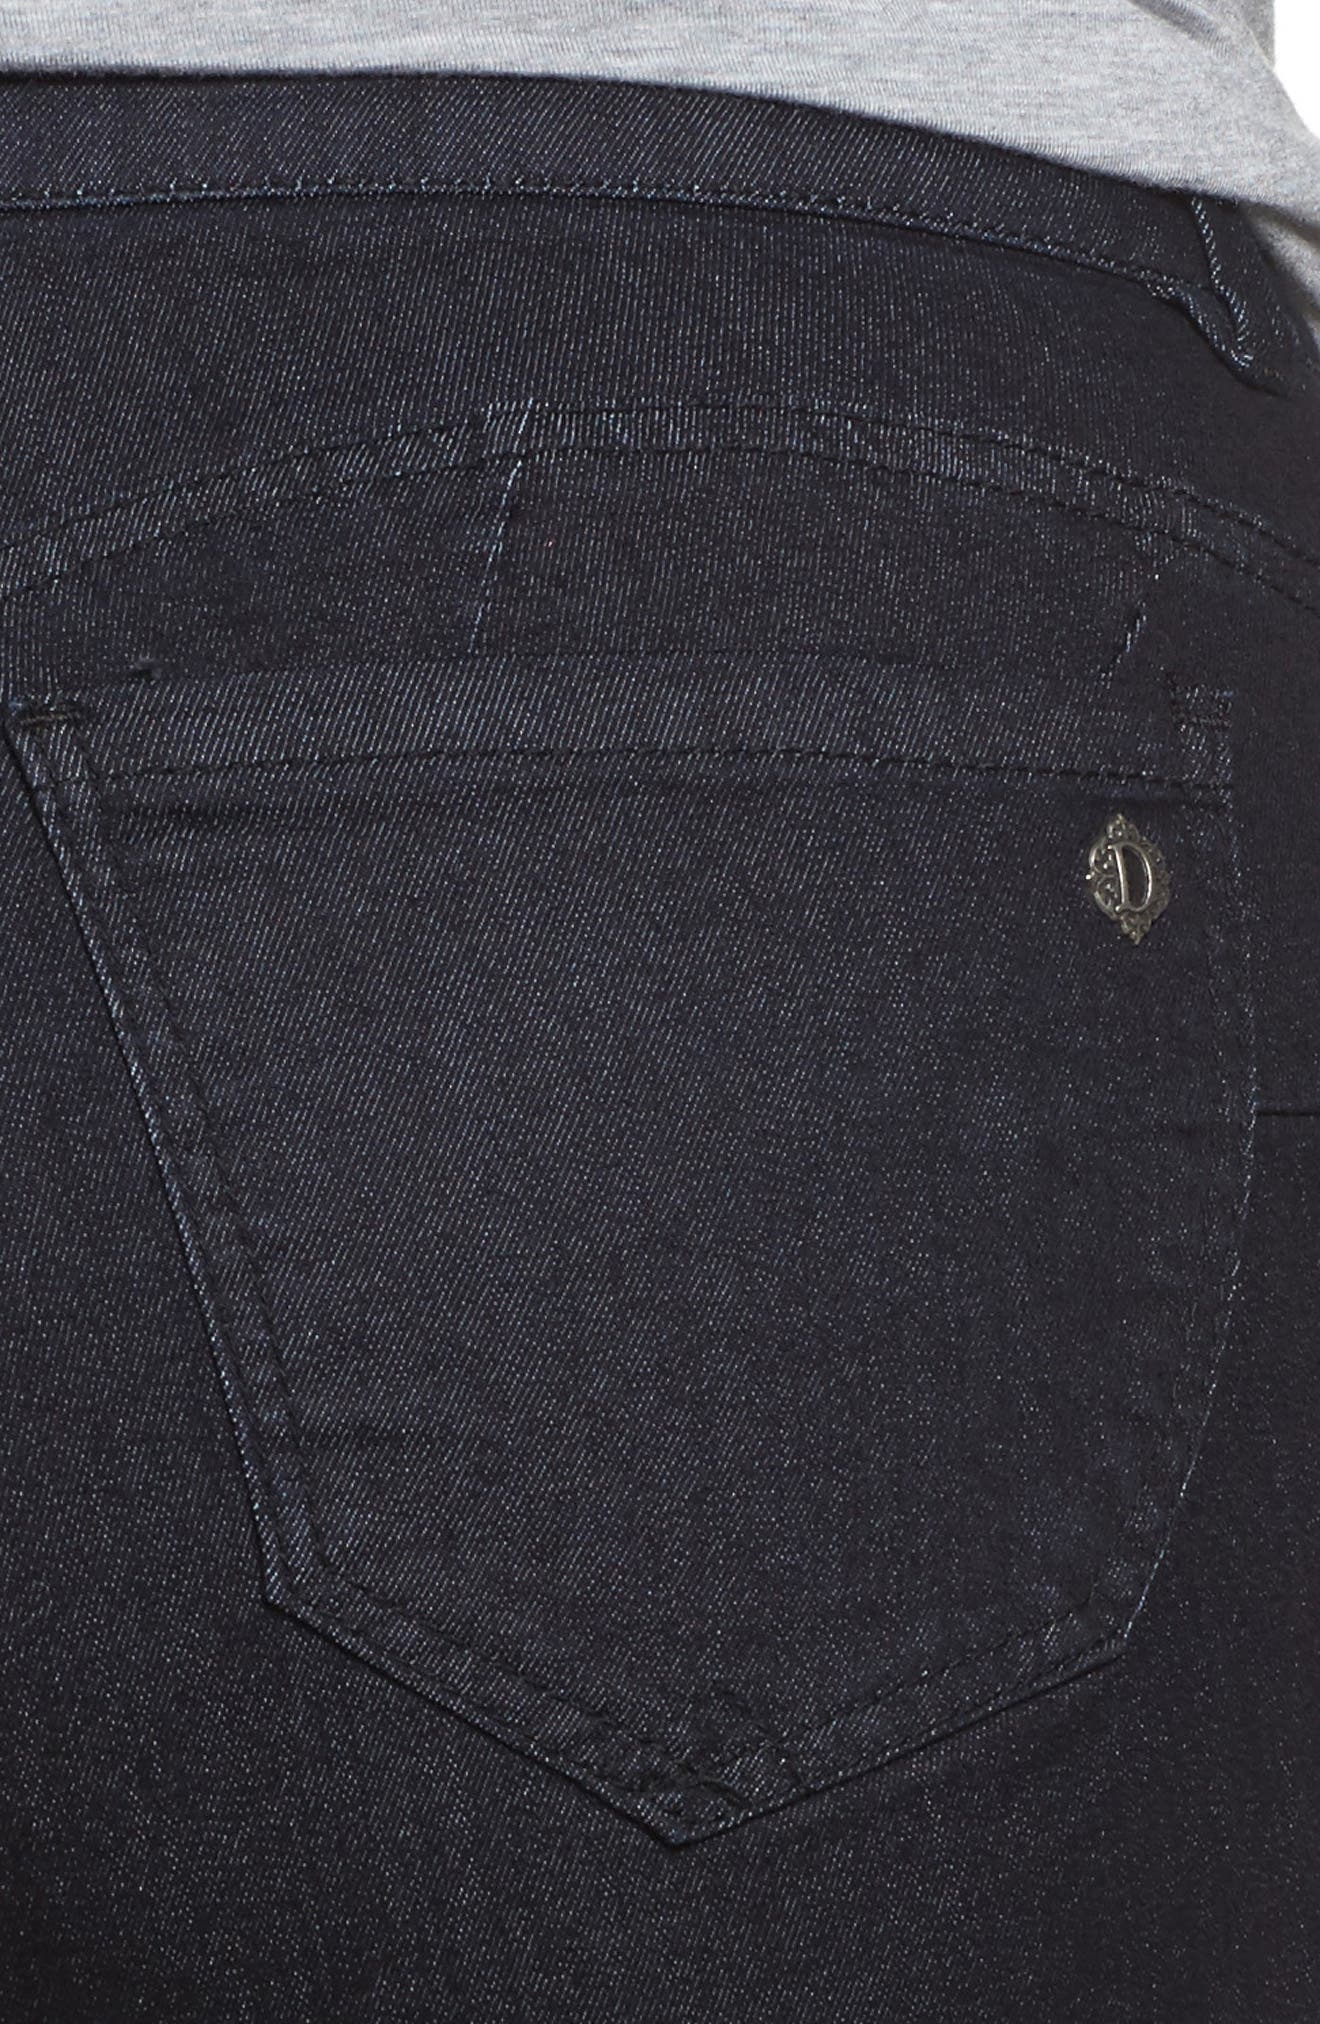 Ab-Solution Stretch Straight Leg Jeans,                             Alternate thumbnail 4, color,                             Indigo